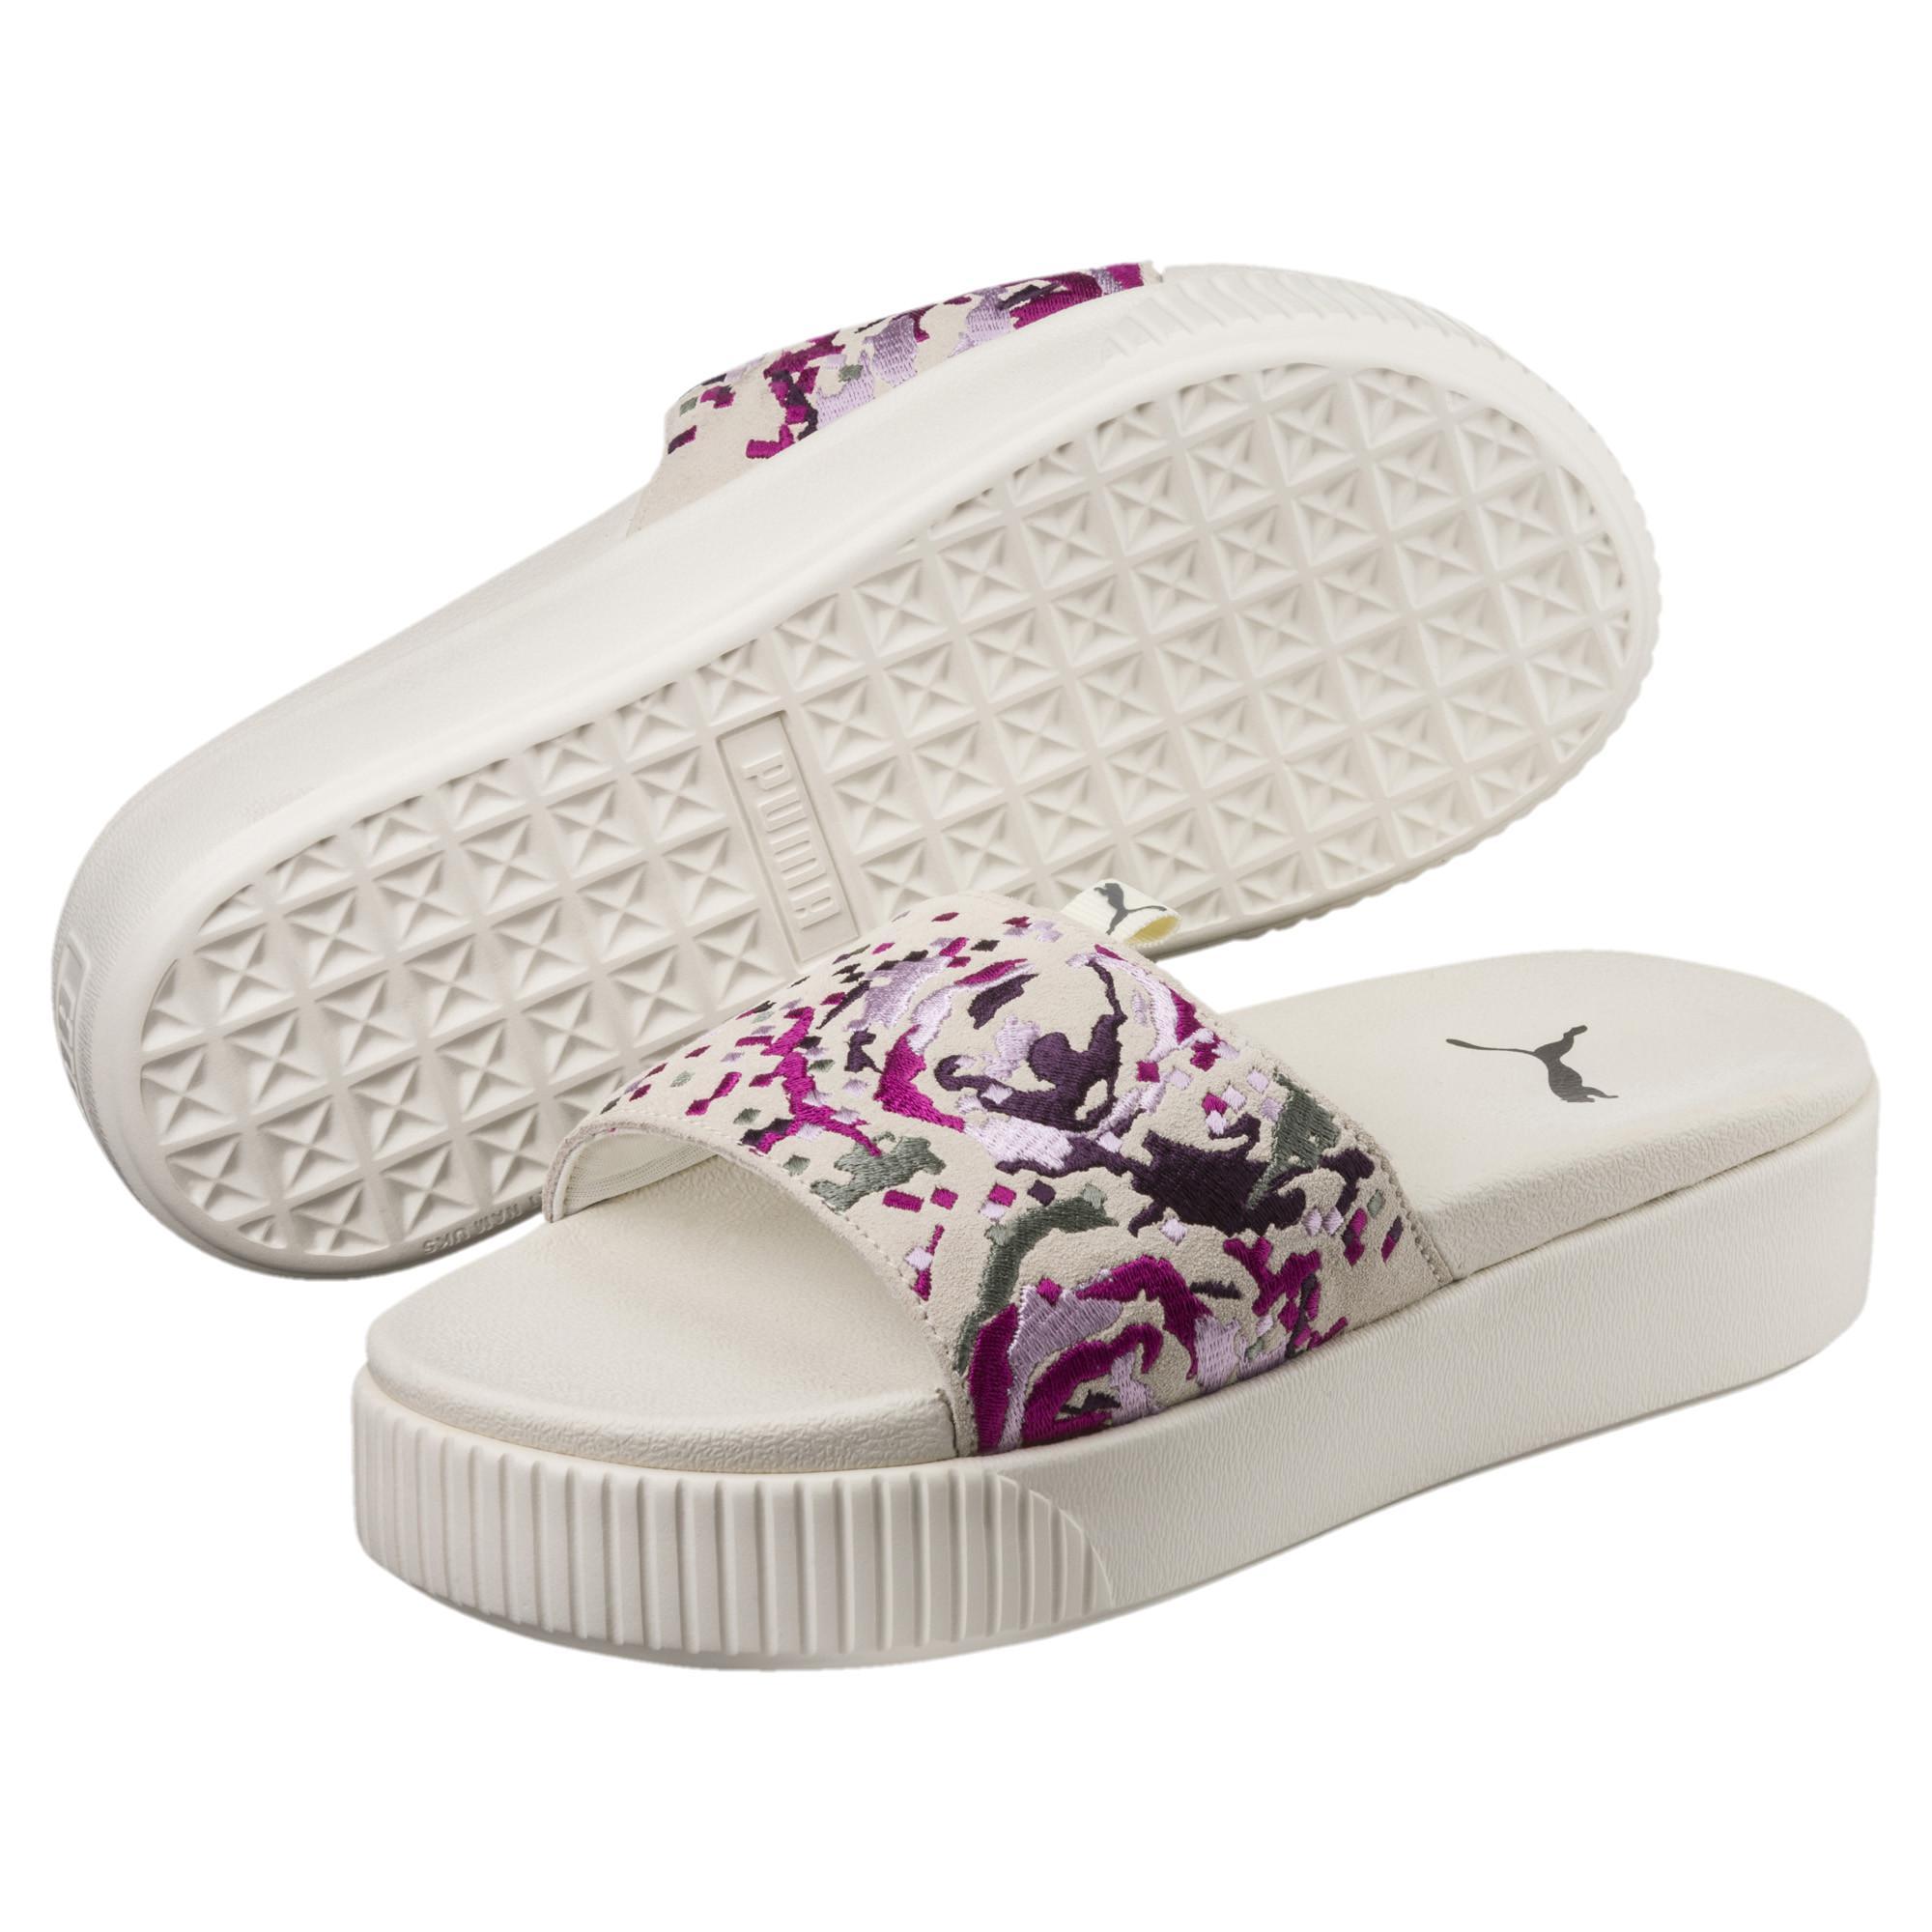 3eaa0680e269 Lyst - PUMA Platform Slide Digital Embroidery Women s Sandals